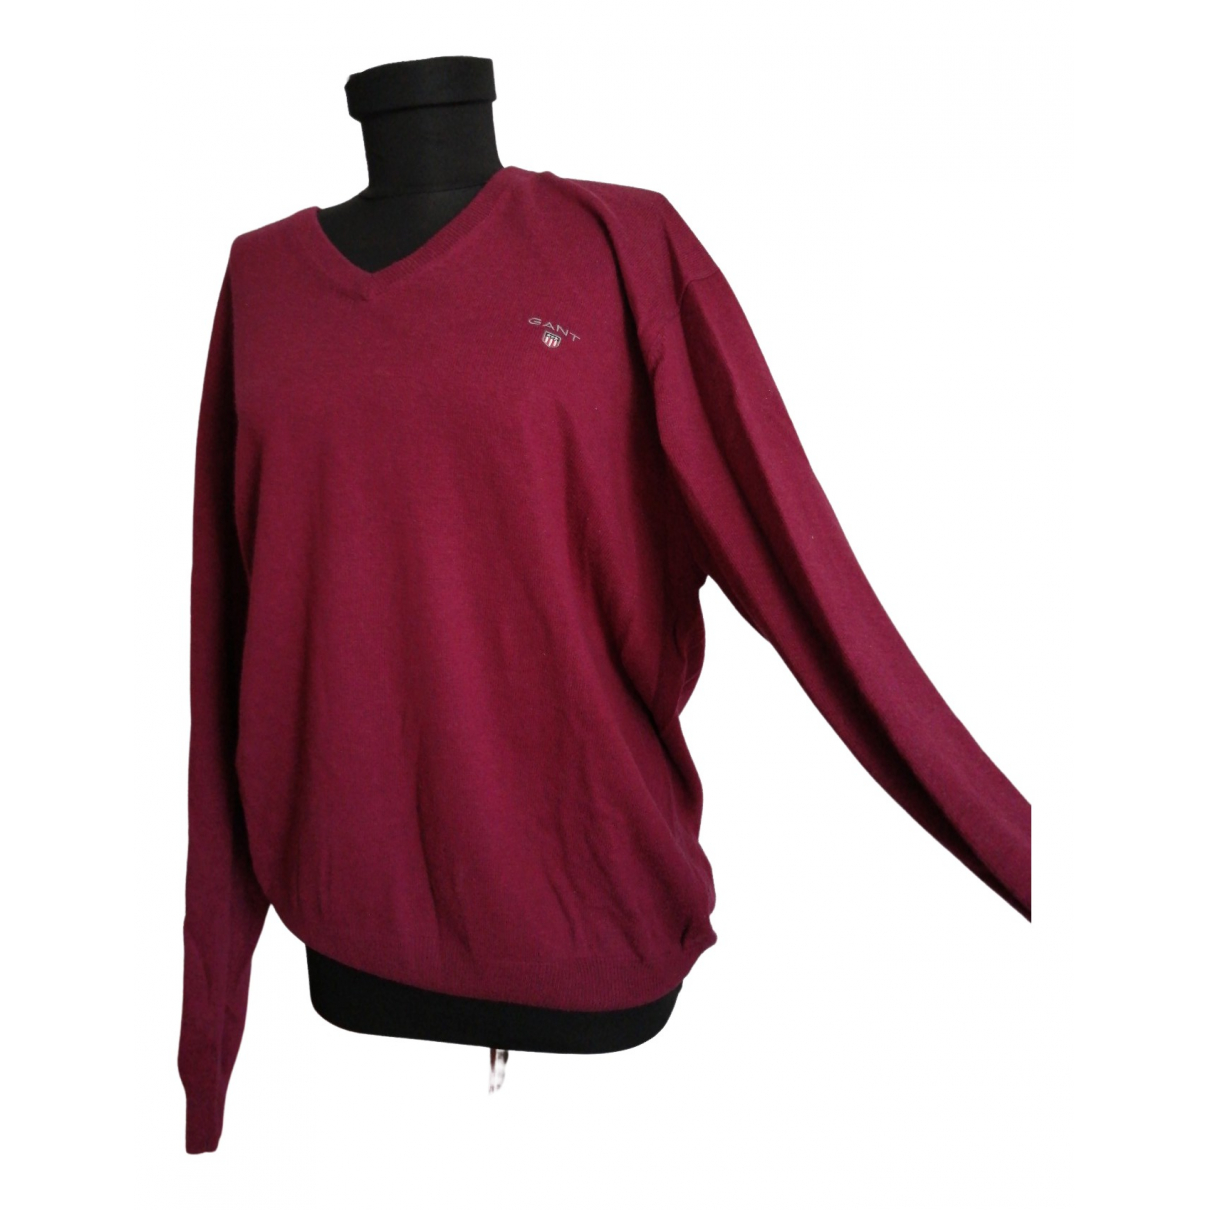 Gant \N Burgundy Wool Knitwear & Sweatshirts for Men L International